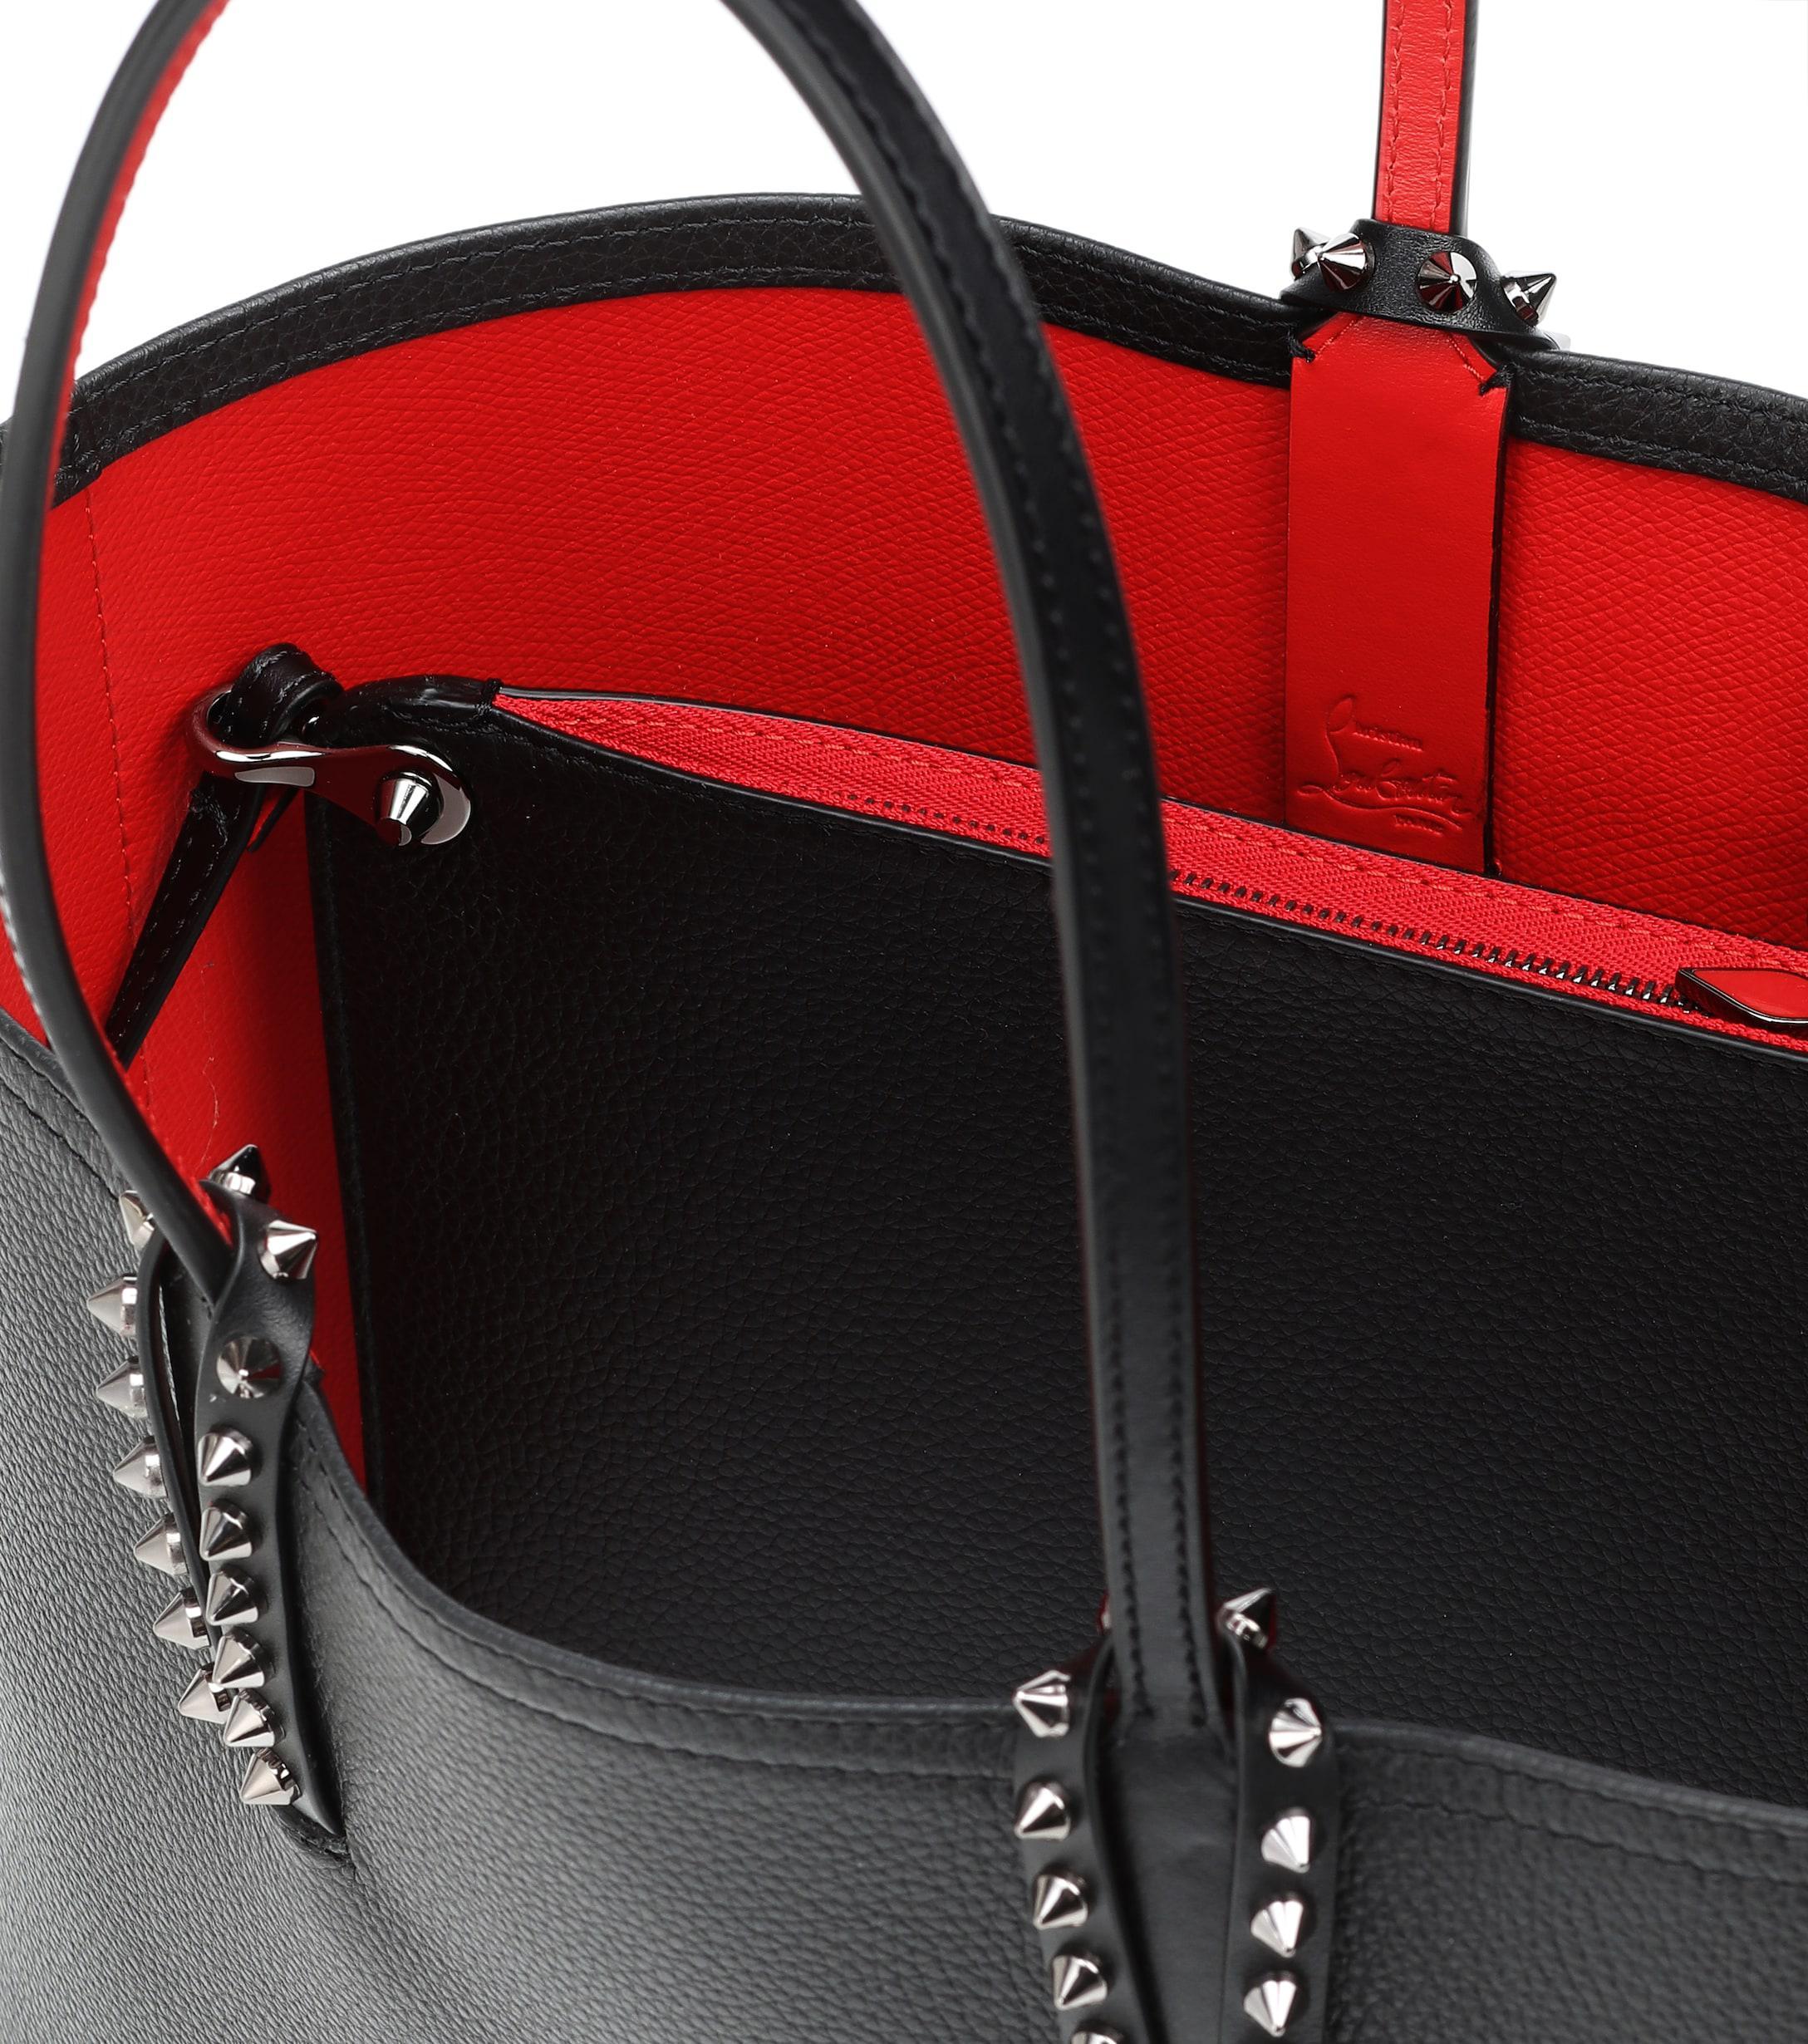 4155ceda5cfa Lyst - Cabas Cabata Small en cuir Christian Louboutin en coloris Noir